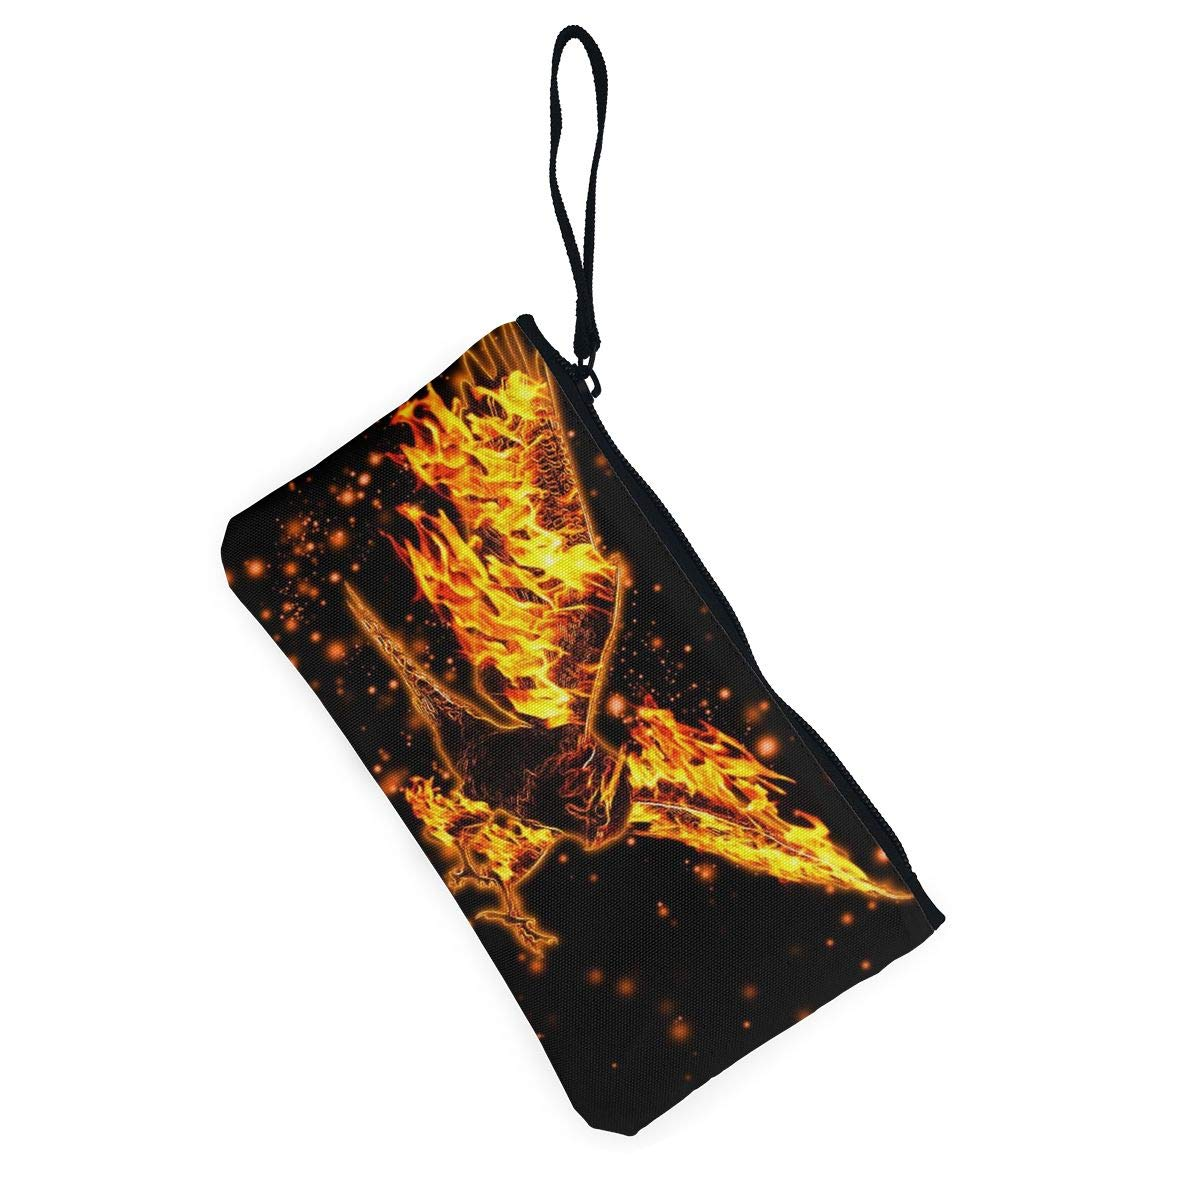 YUANSHAN Fire Eagle Unisex Canvas Coin Purse Change Cash Bag Zipper Small Purse Wallets with Handle